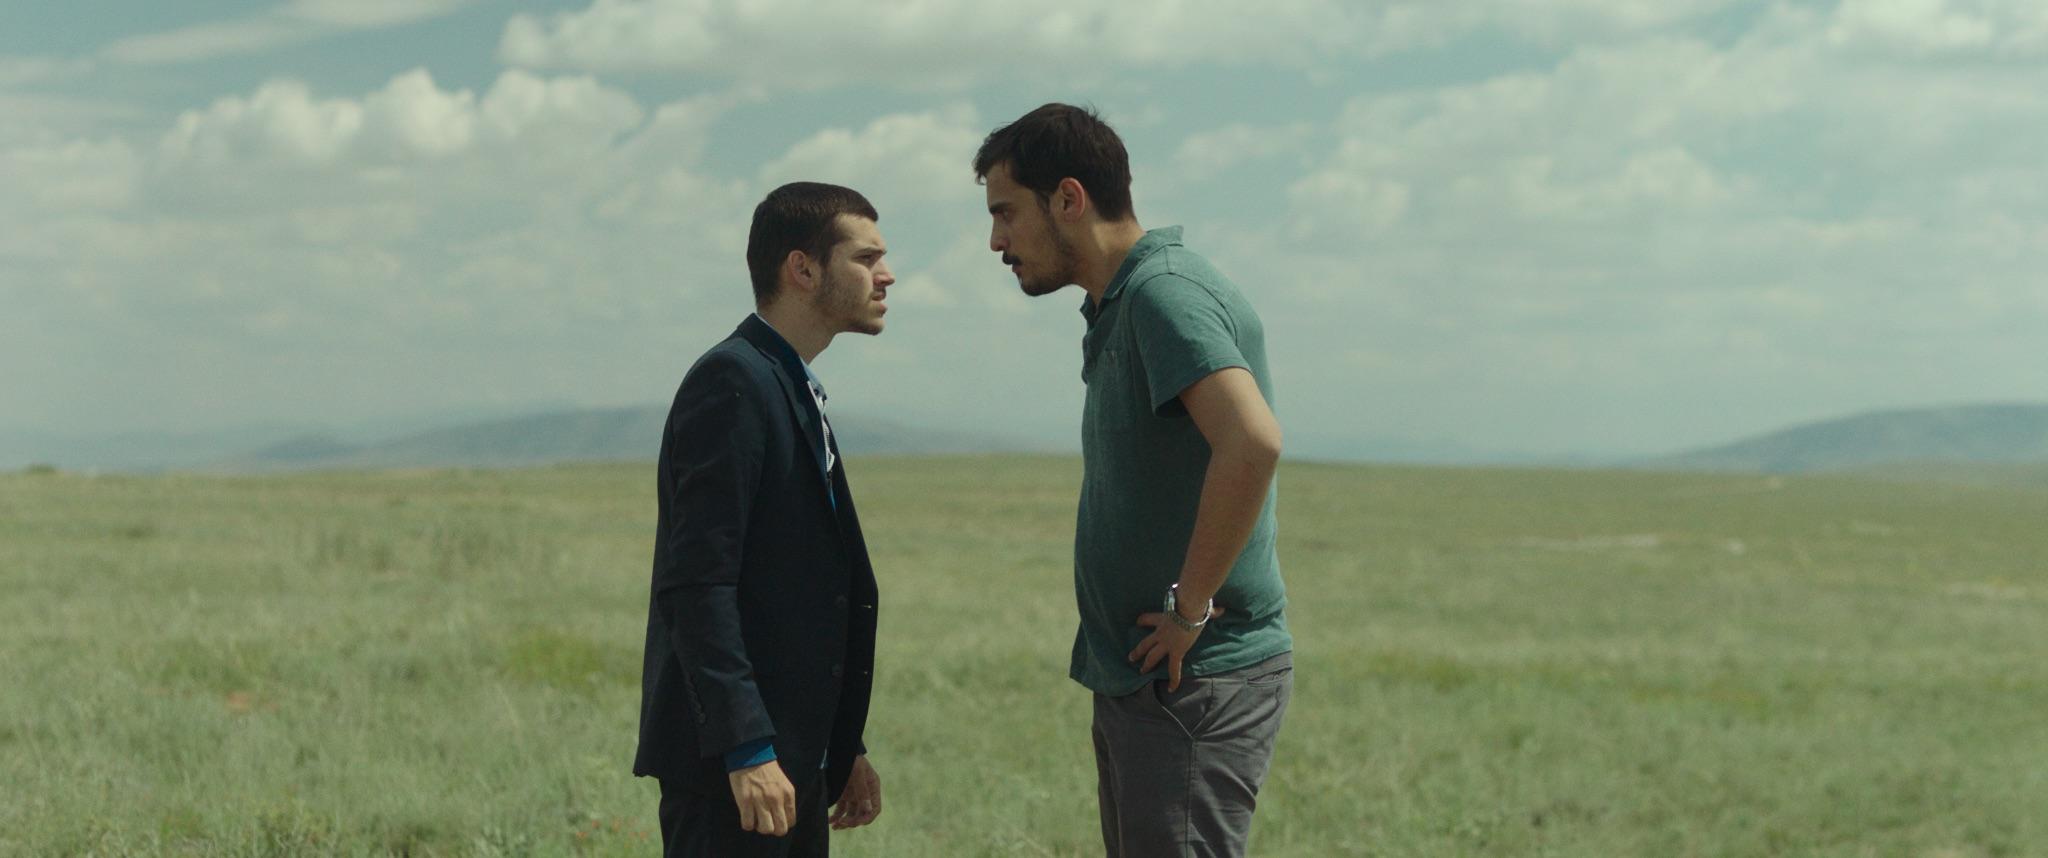 BROTHERS / KARDEÞLER awarded as Best Feature Film